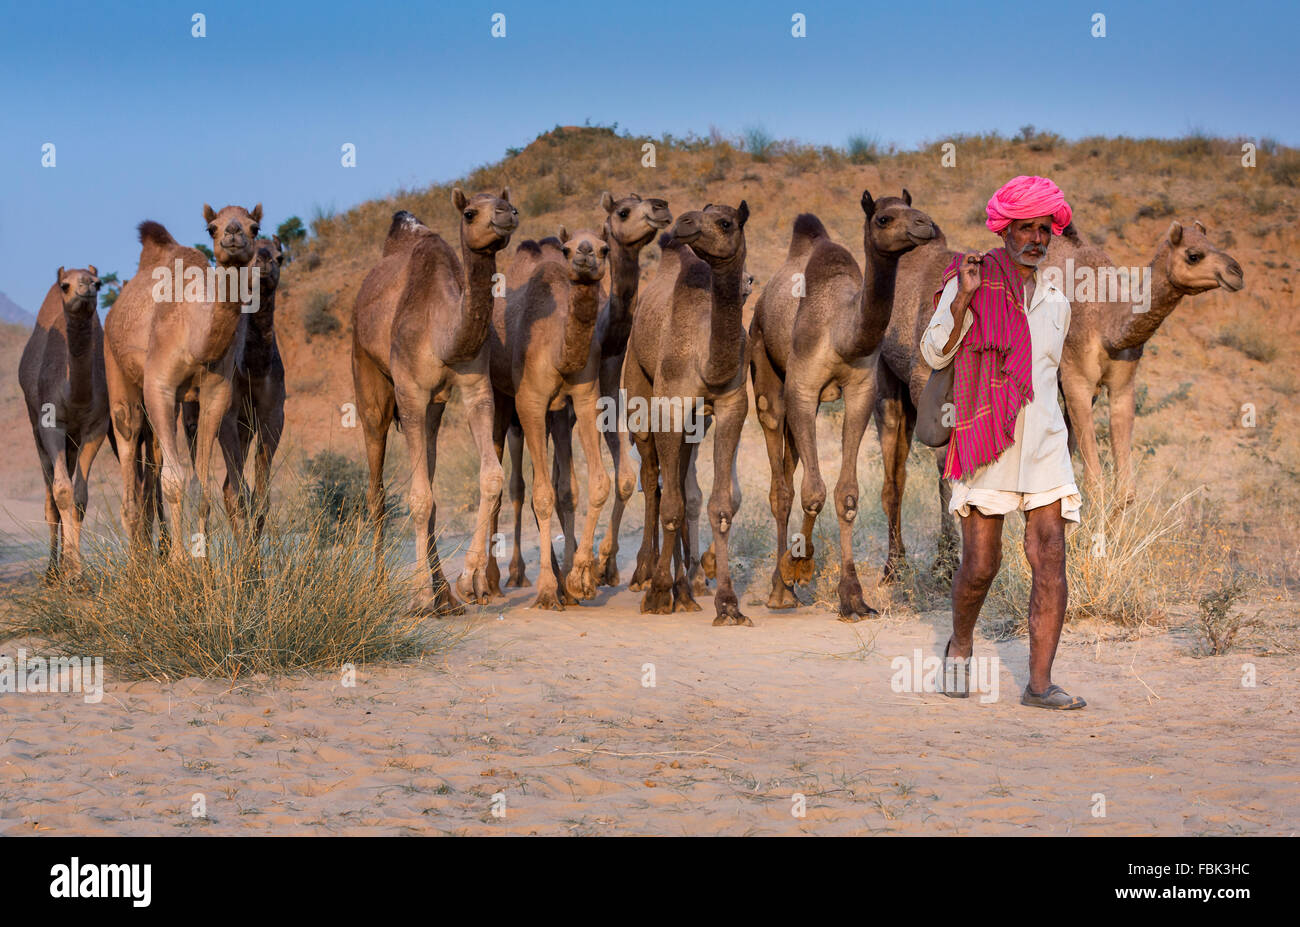 Camel driver con i suoi cammelli sul modo di Pushkar Mela, Pushkar Camel Fair, Rajasthan, India Immagini Stock